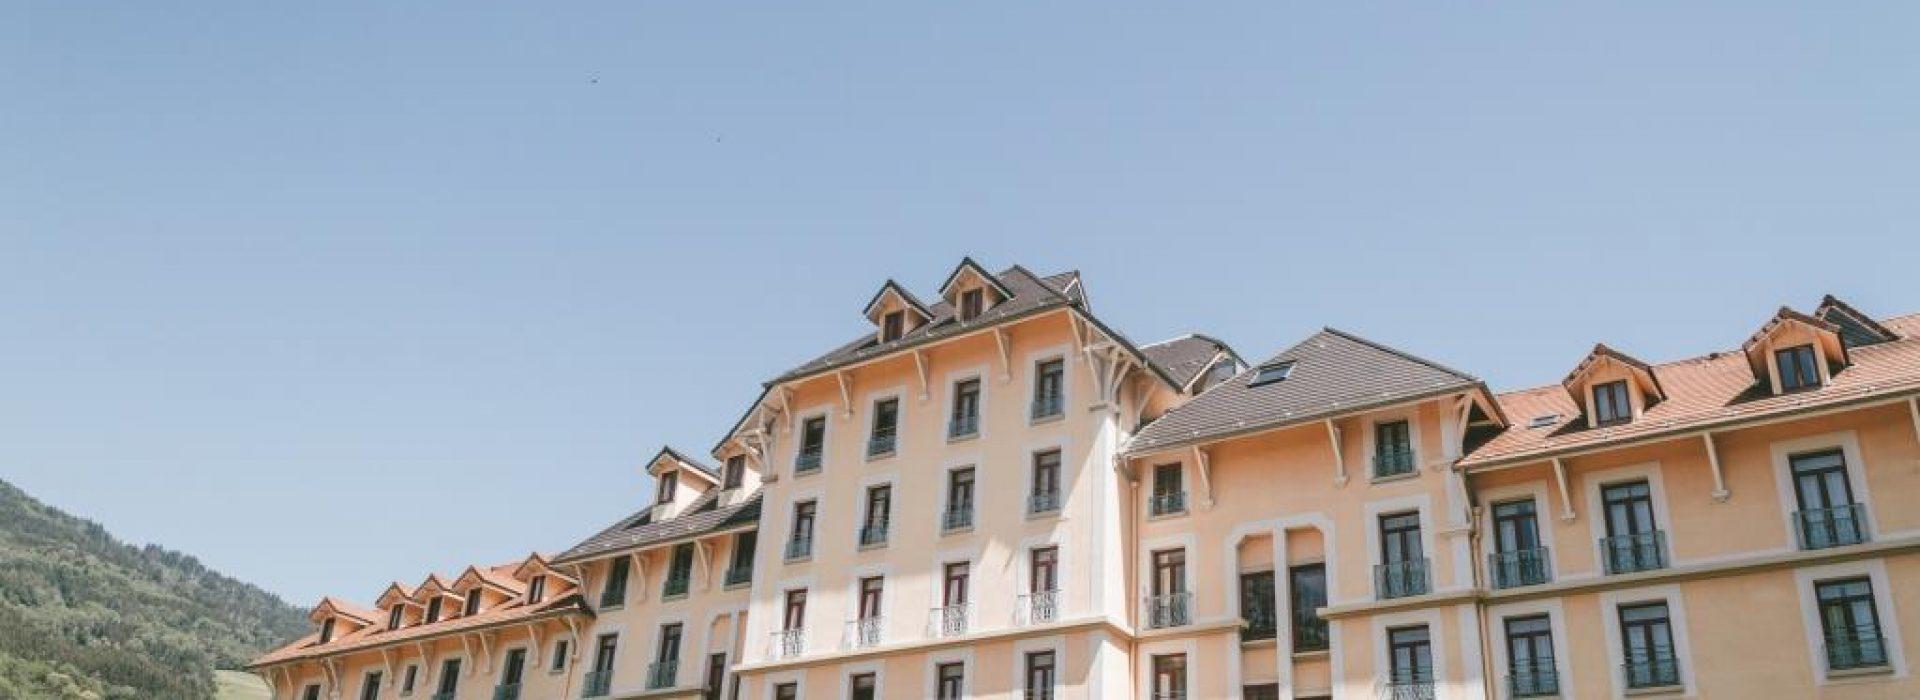 Appart'hôtel Le Splendid